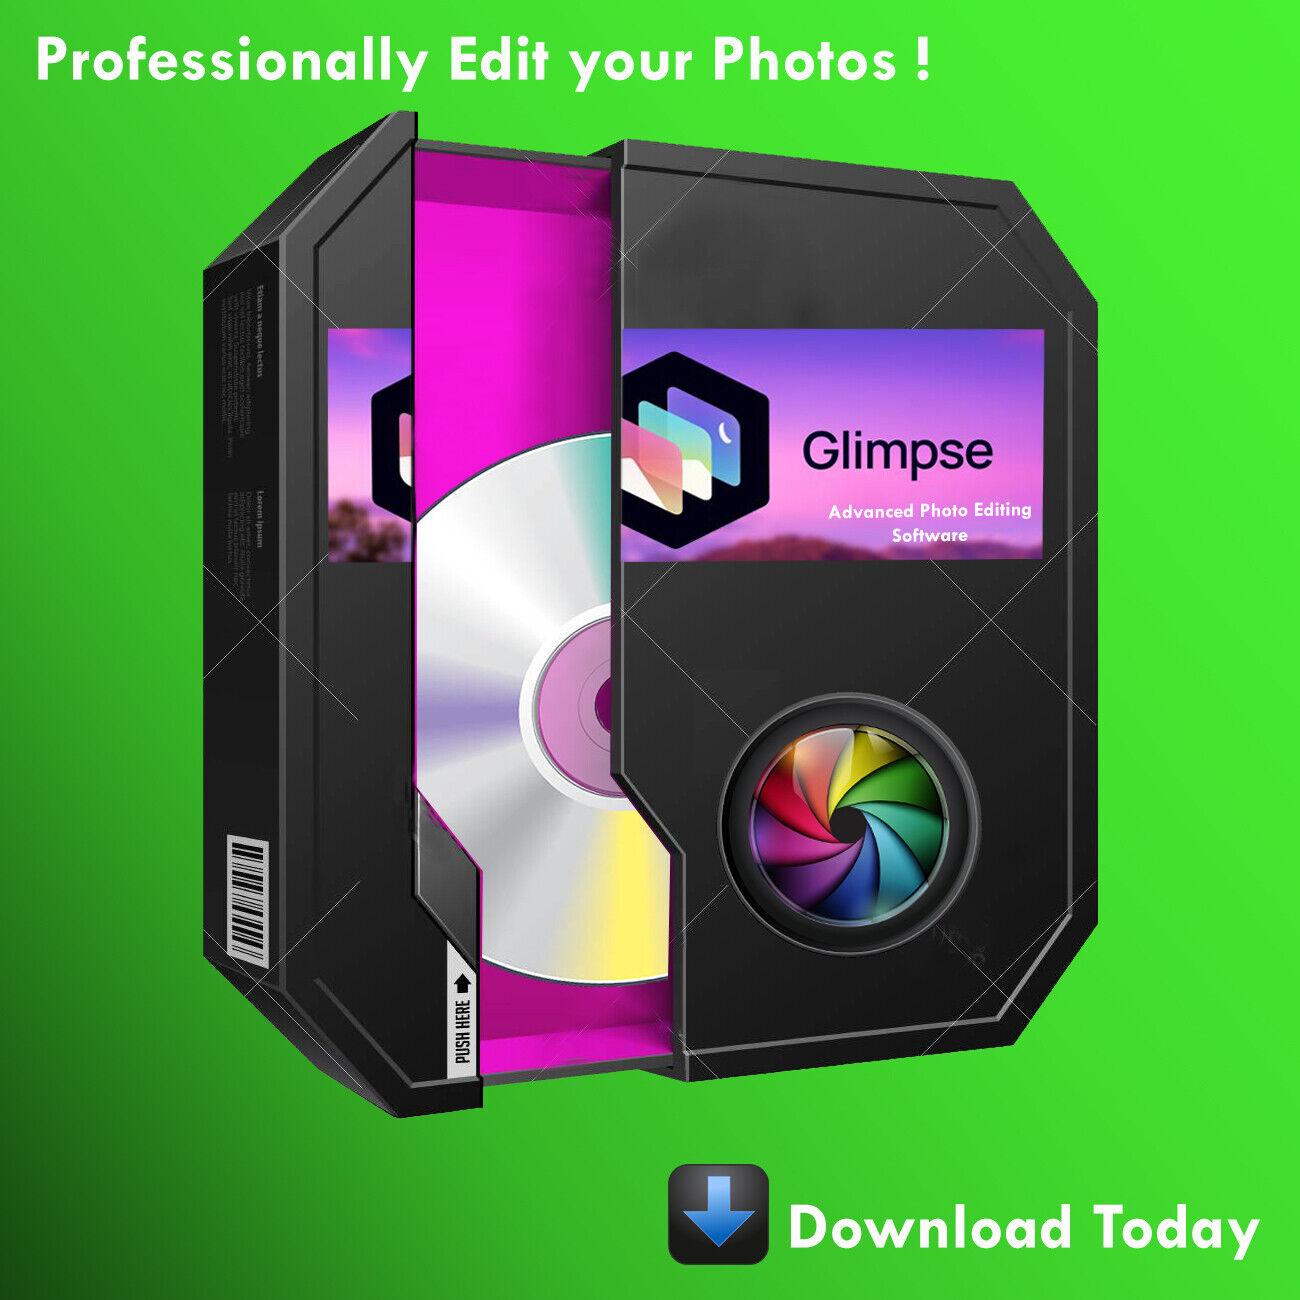 Professional Photography/Photo Editing Image Software - GLIMPSE v.1 - PC Windows